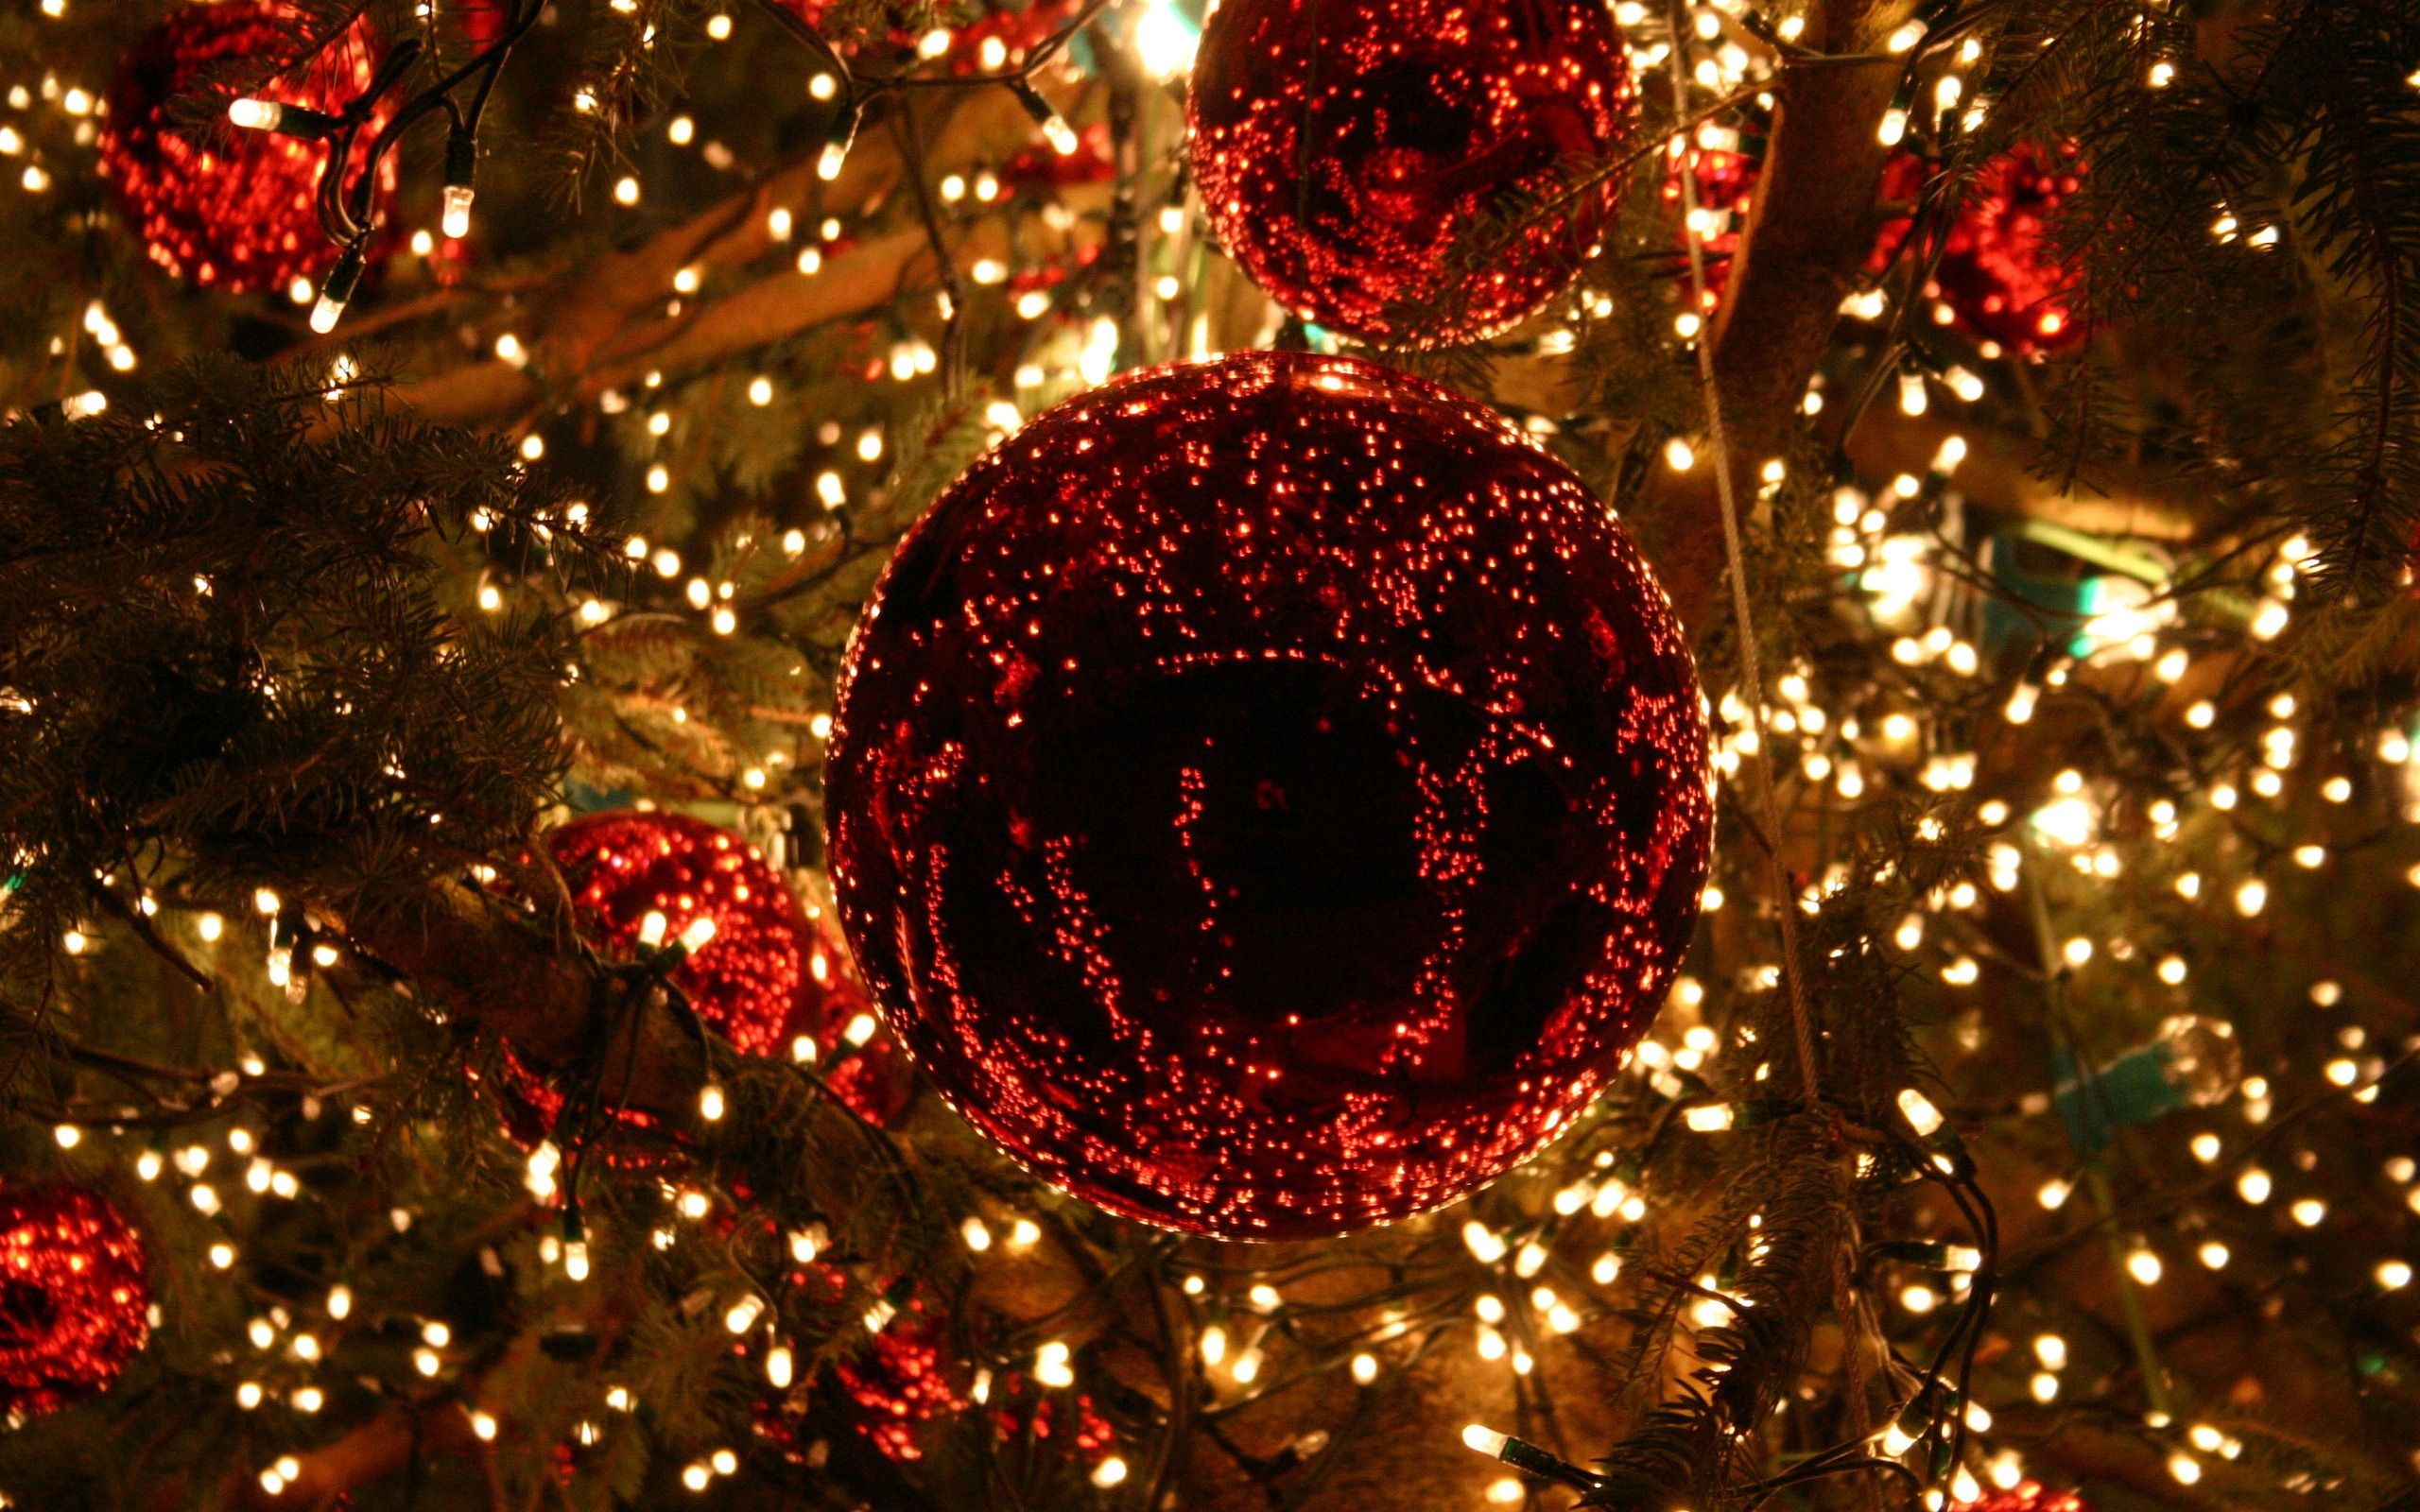 Christmas lights wallpaper hd 1080p